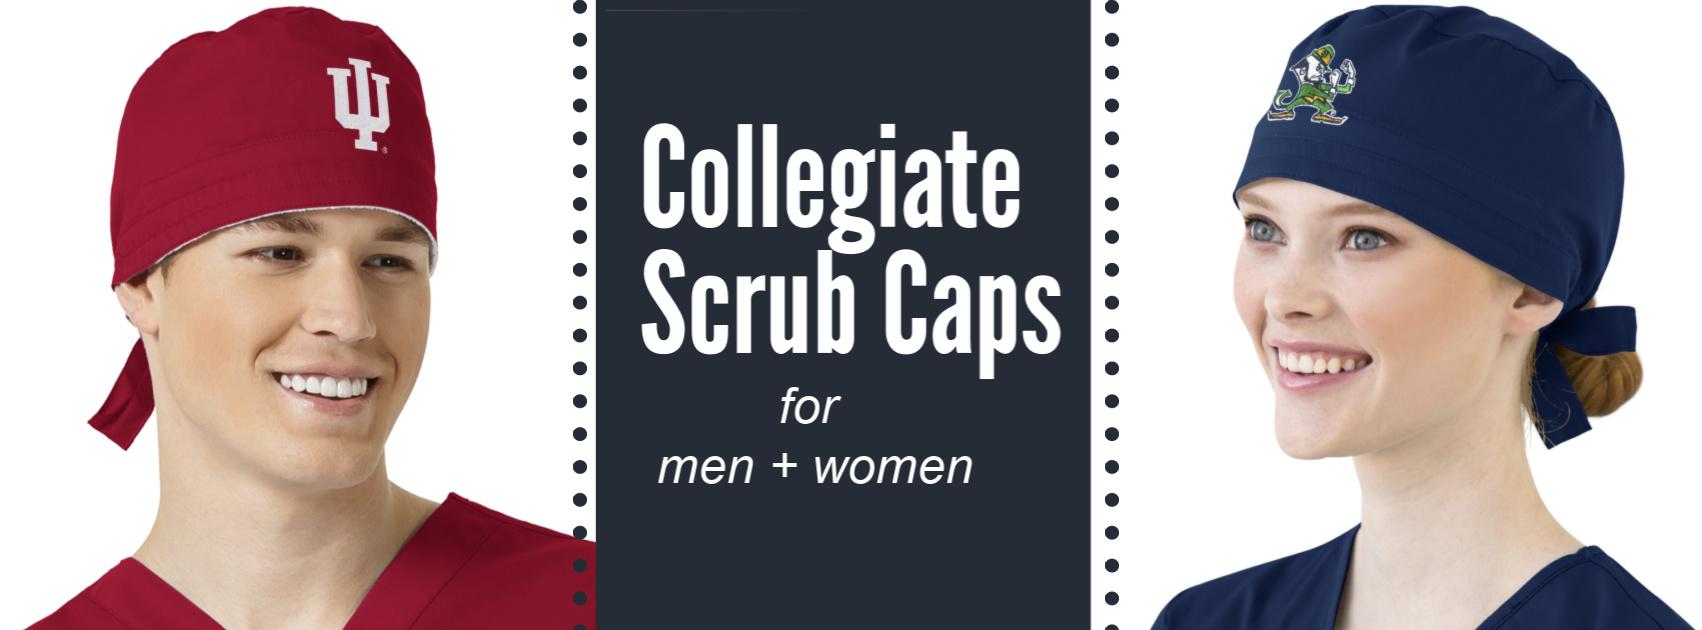 collegiatescrubcap-page.jpg